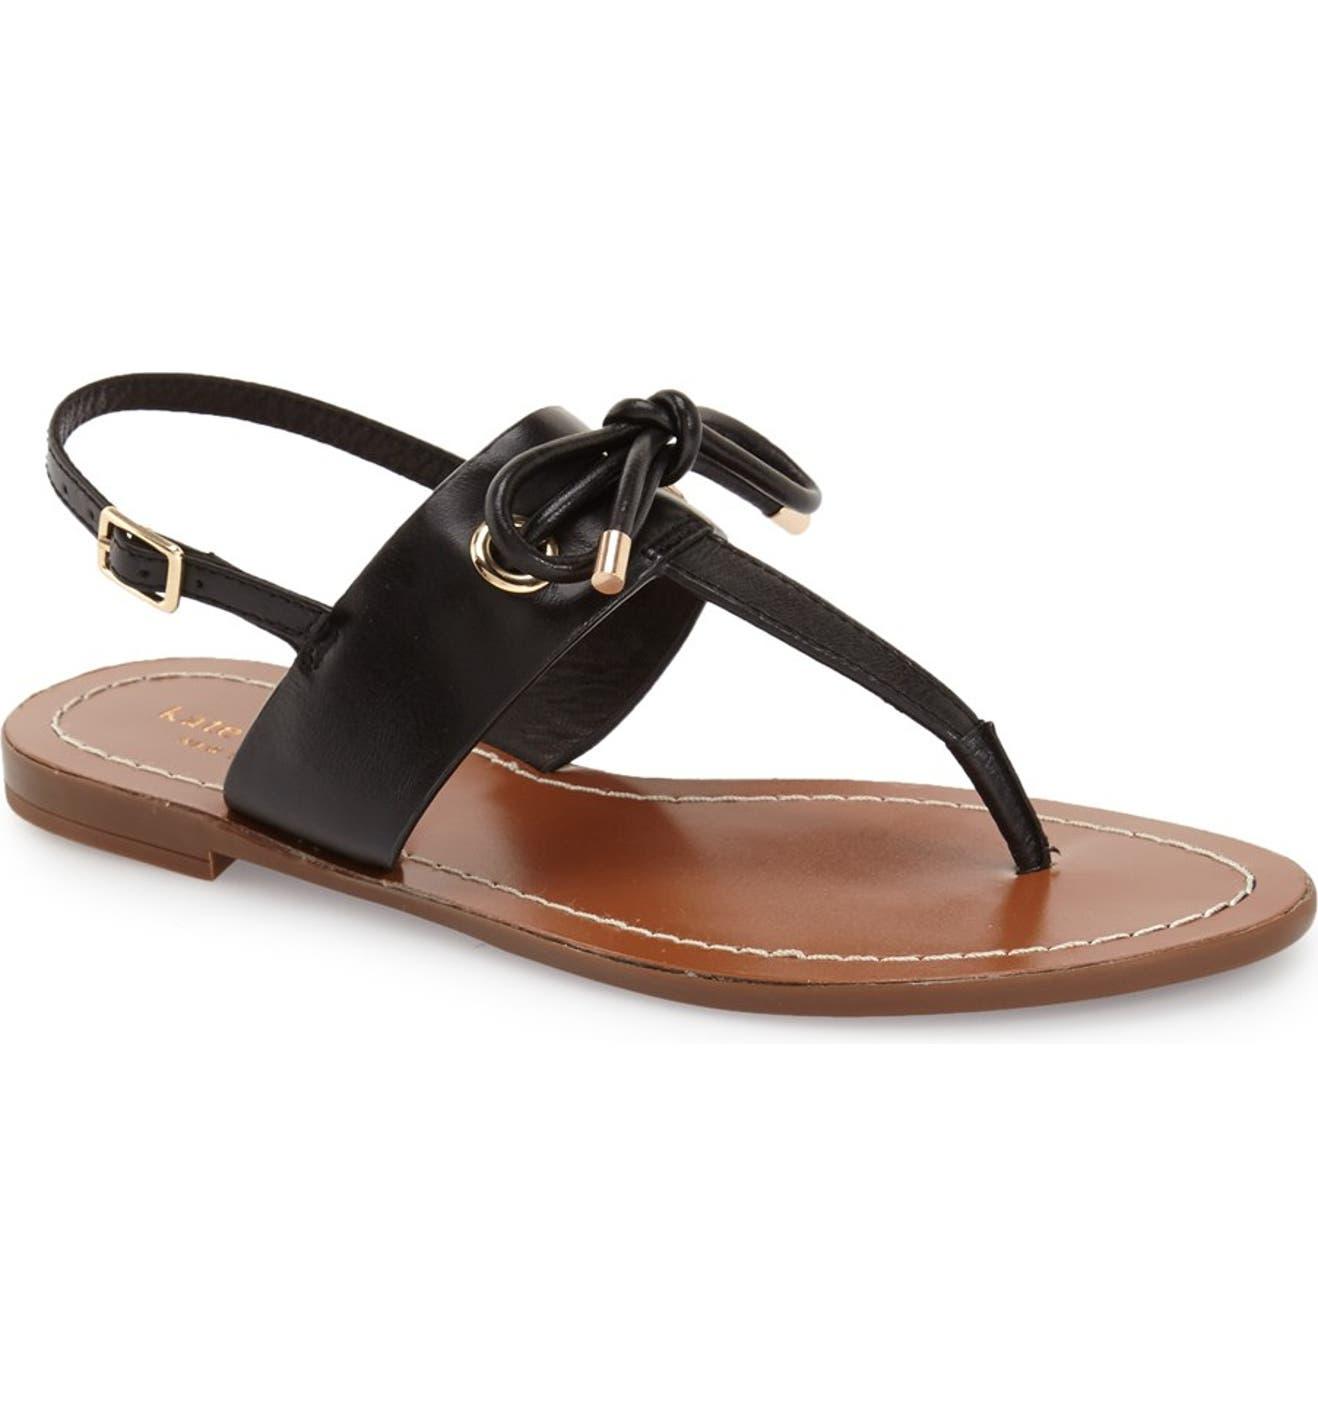 e78dbb871 kate spade new york  carolina  thong sandal (Women)